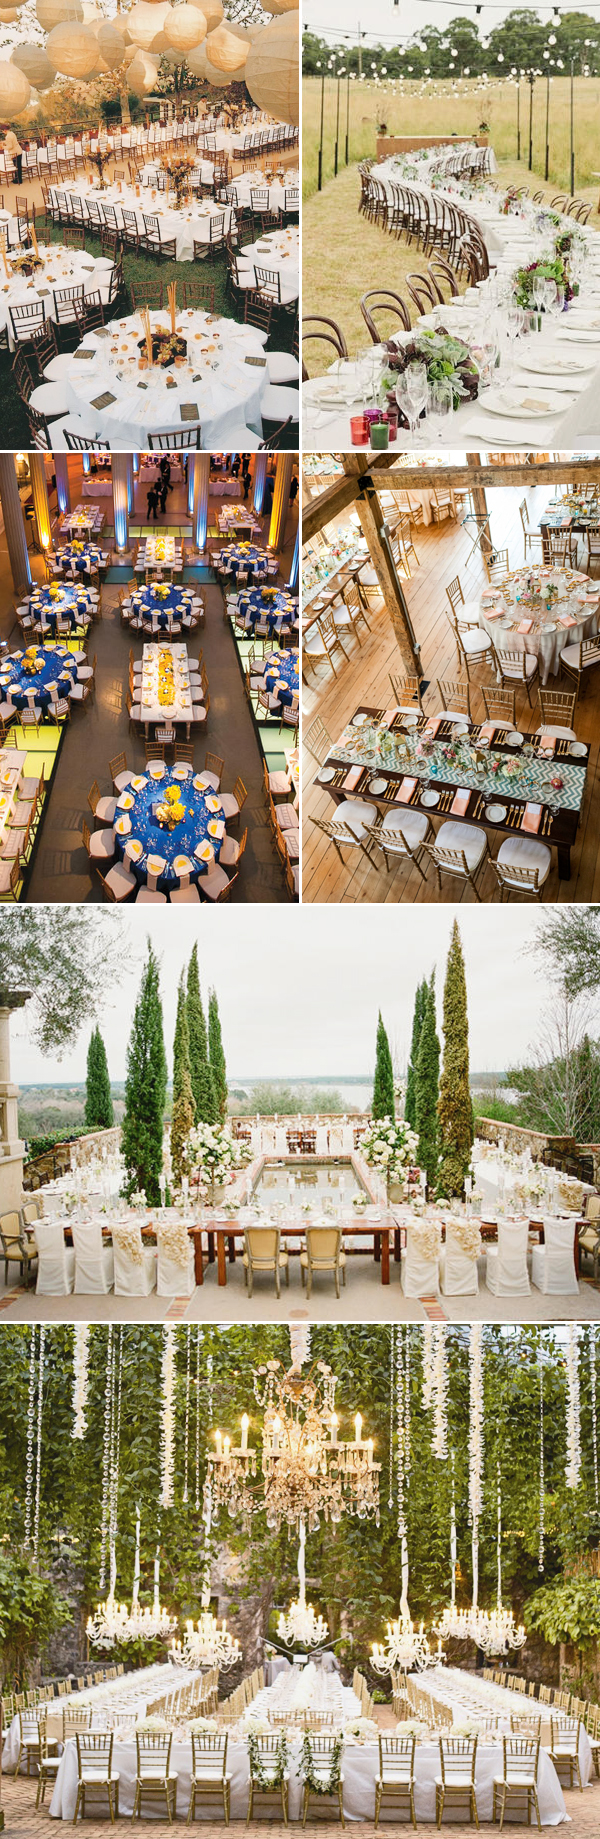 weddingdecor03-seatingplan